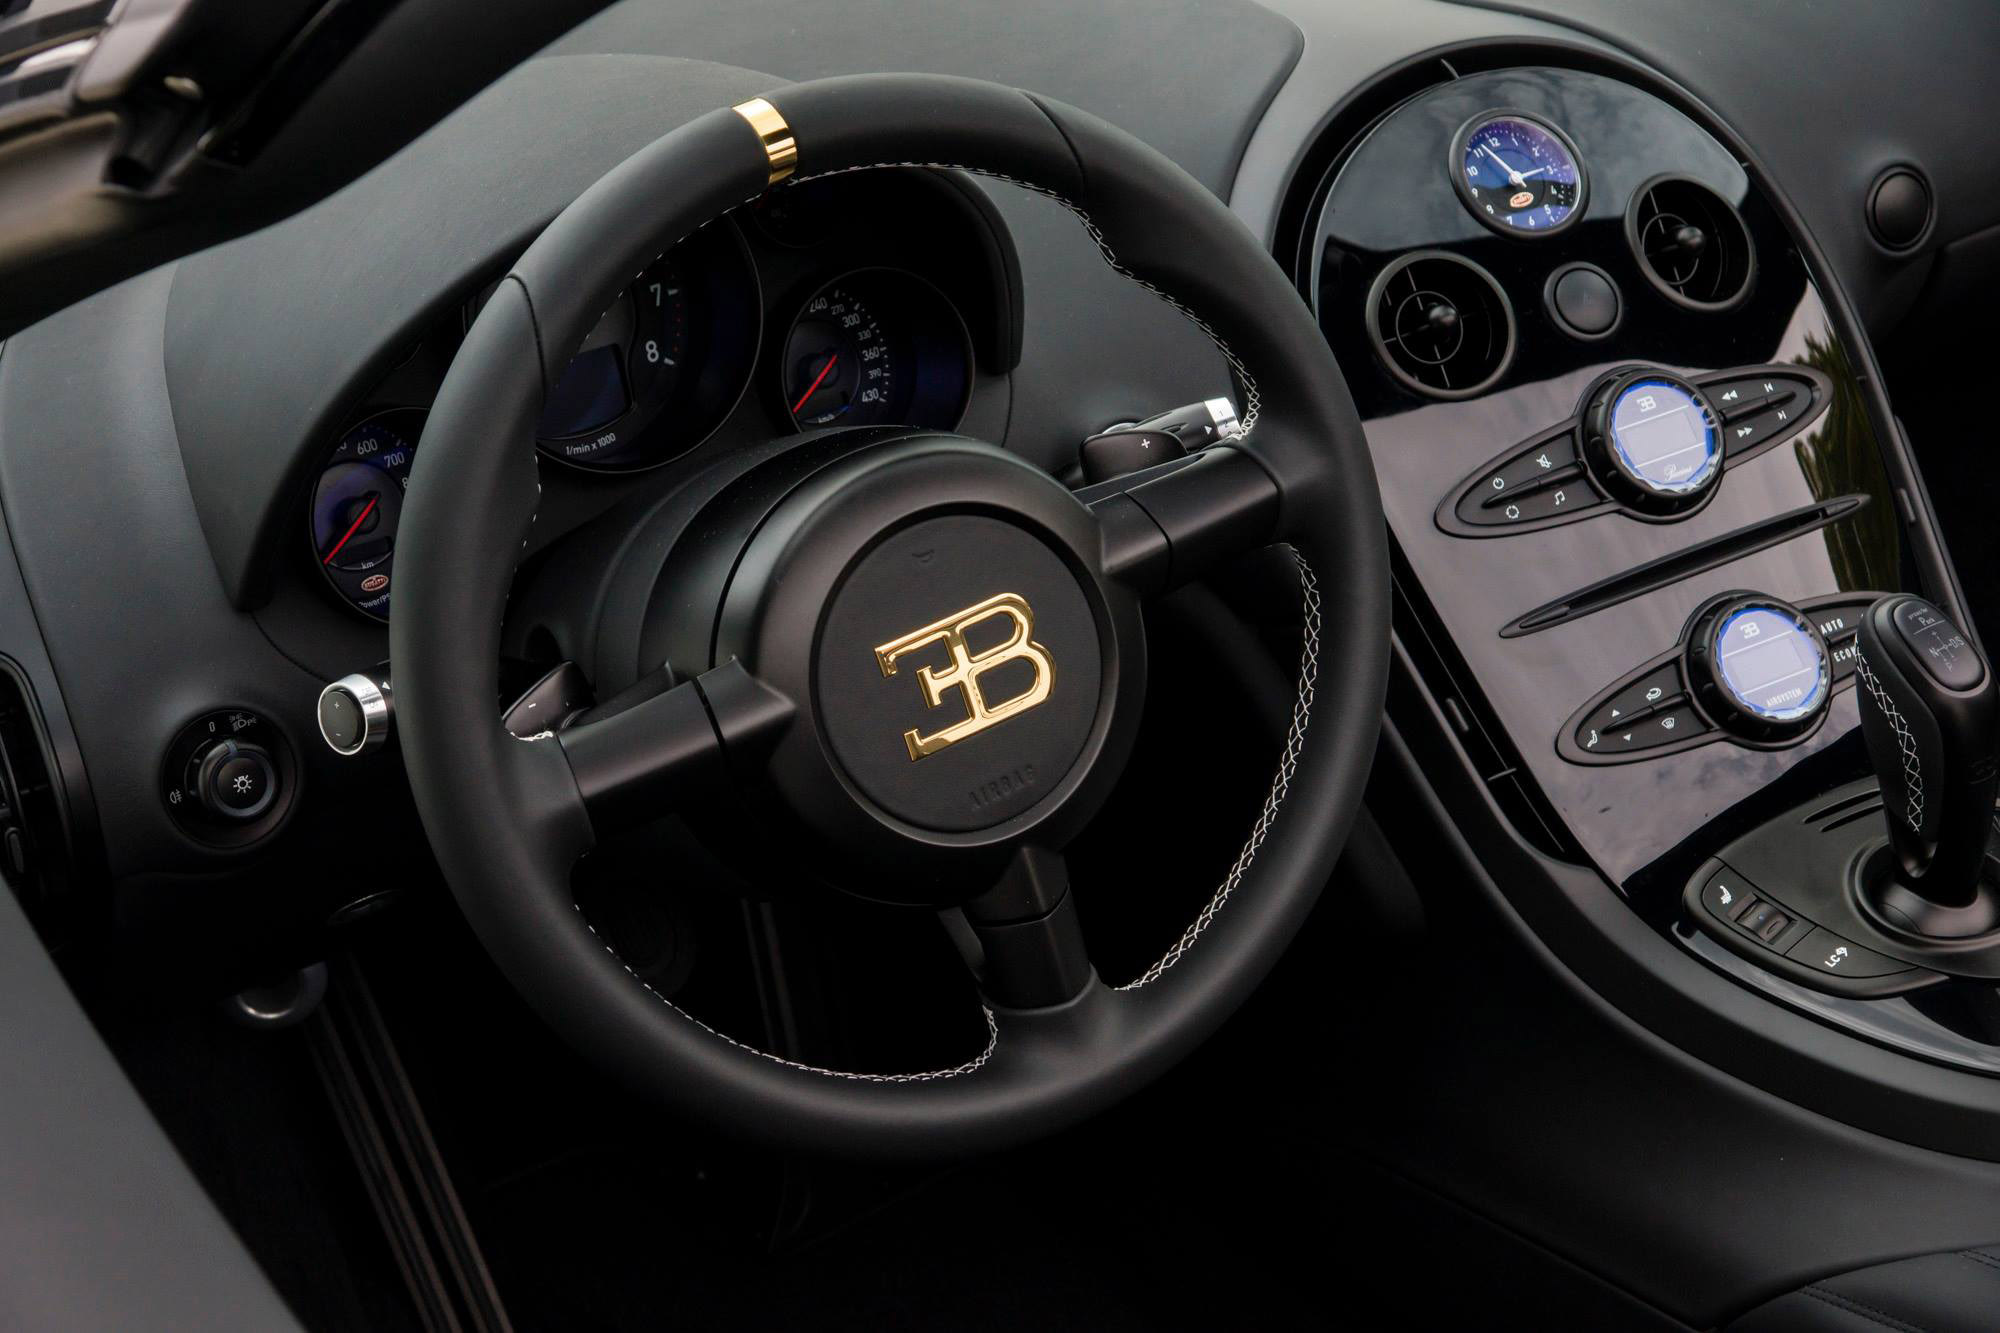 bugatti-grand-sport-vitesse-lang-lang-special-edition-08 Stunning Bugatti Veyron 16.4 Grand Sport Vitesse Interior Cars Trend